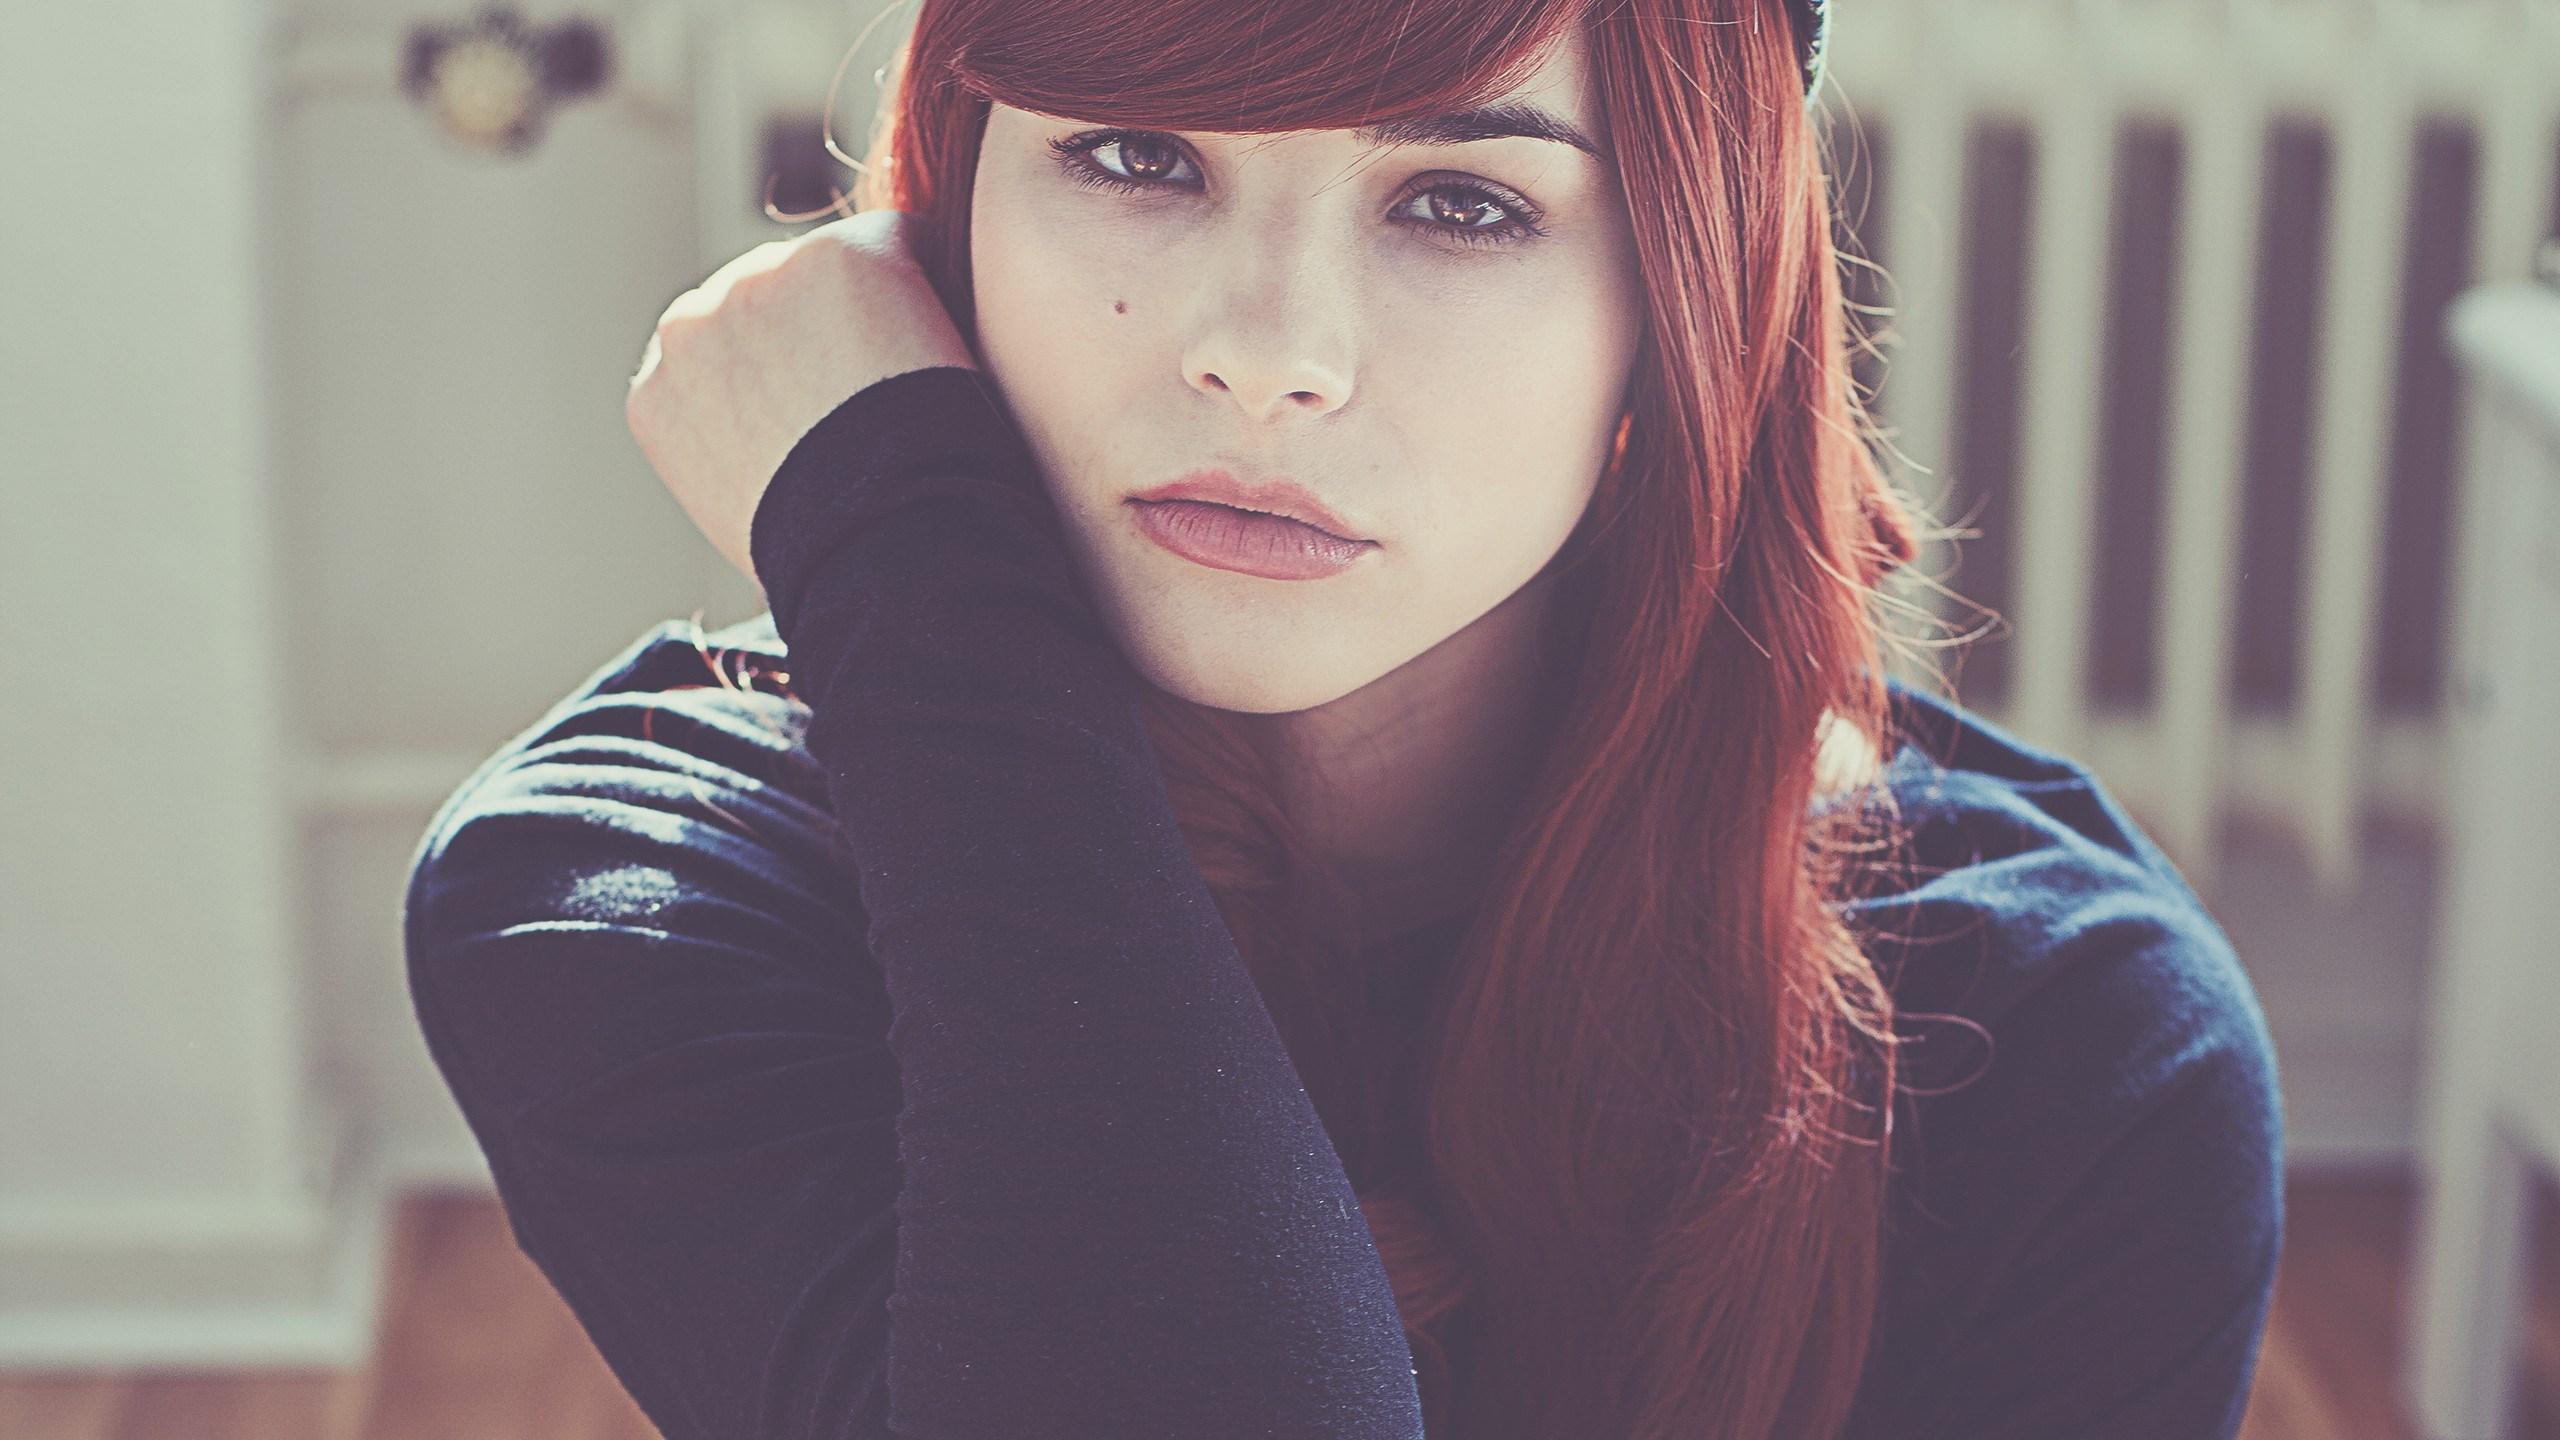 Beautiful Redhead Girl Look